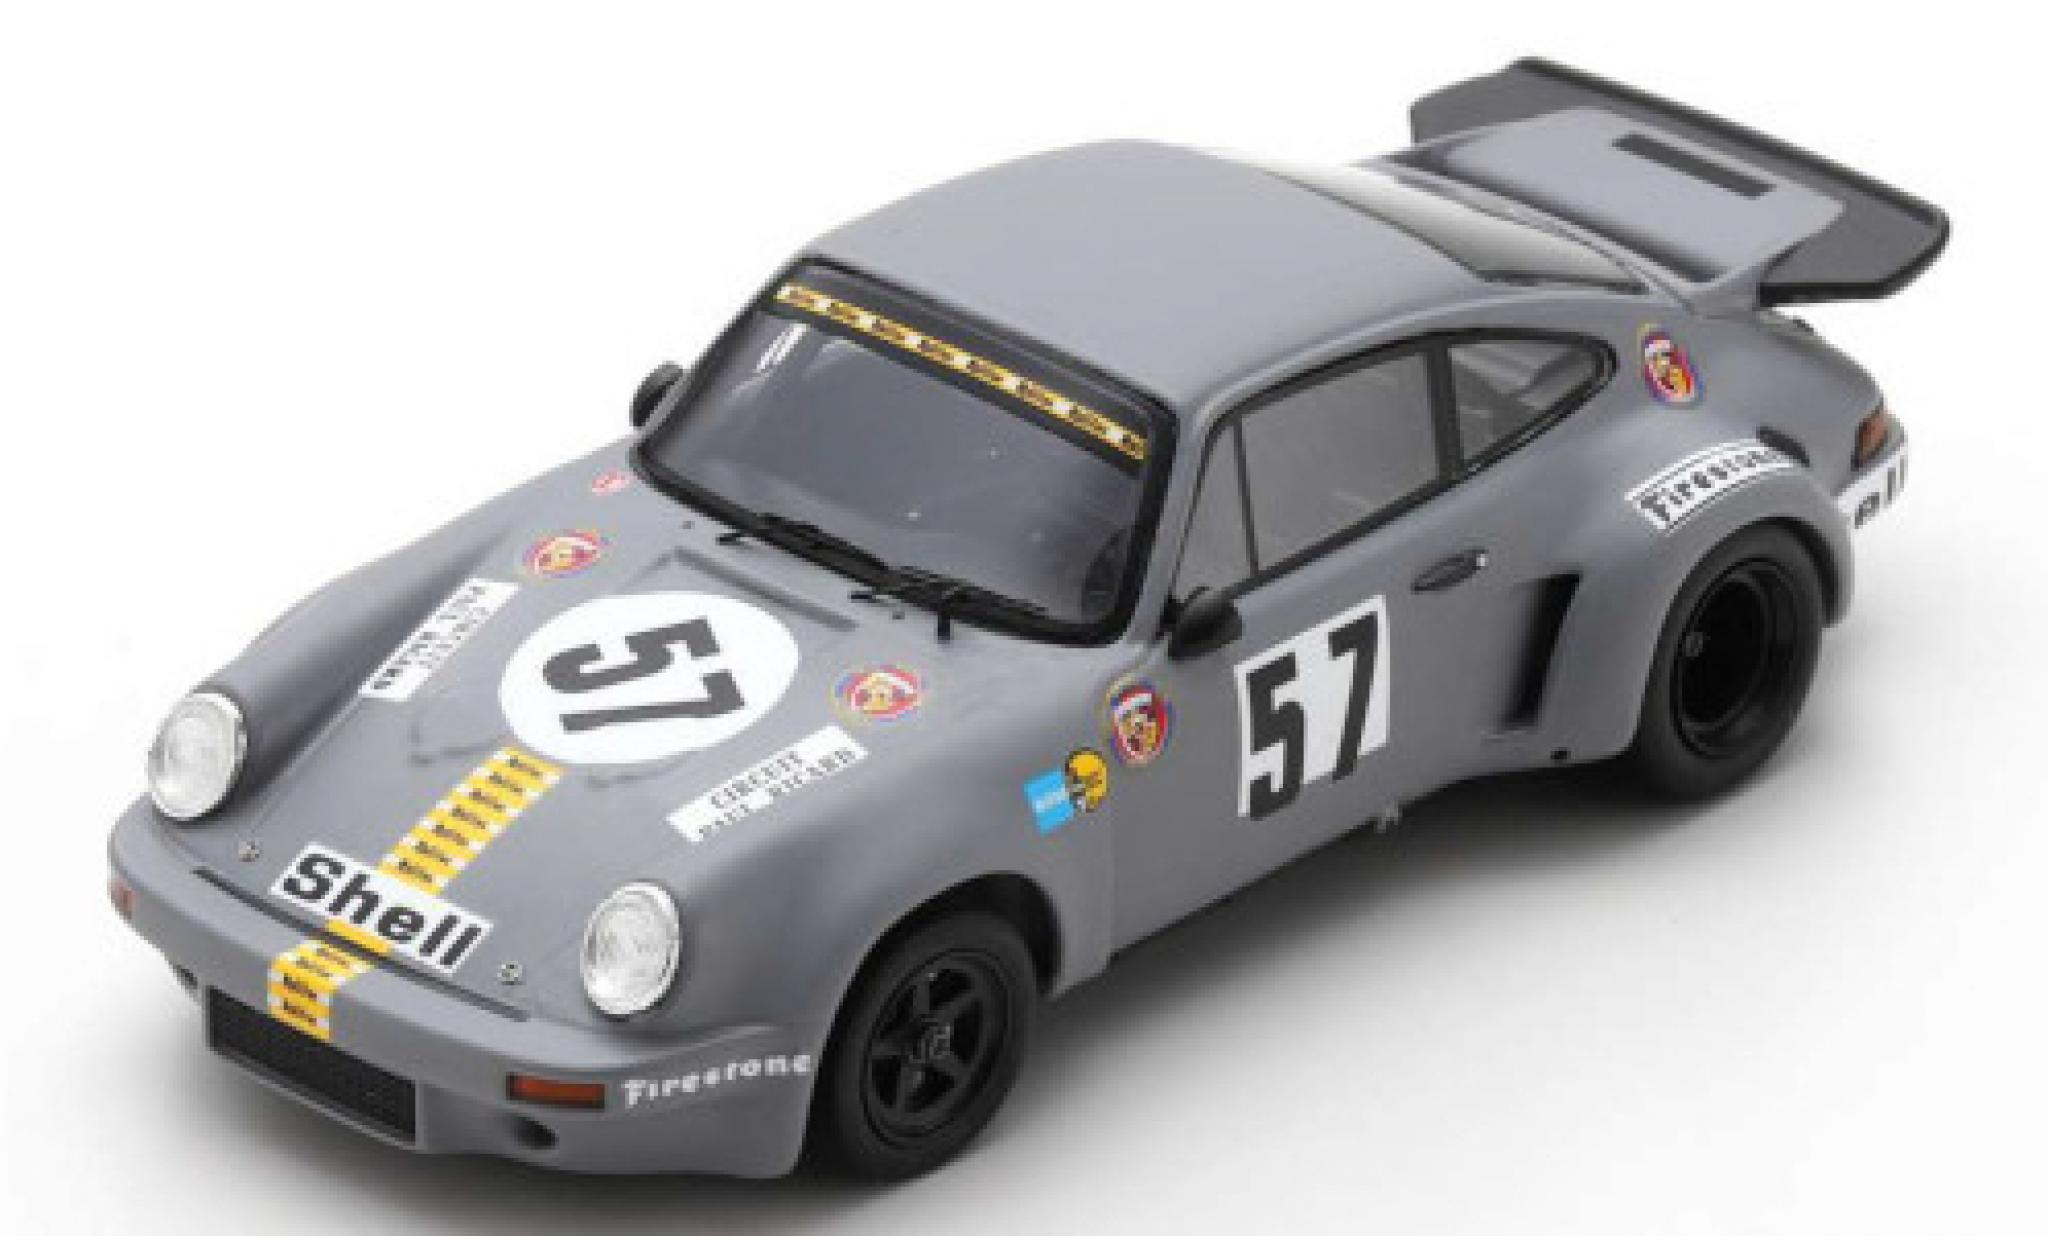 Porsche 930 RSR 1/43 Spark 911 Carrera 3.0 No.57 Gelo Racing 1000km Le Castellet 1974 T.Schenken/R.Stommelen